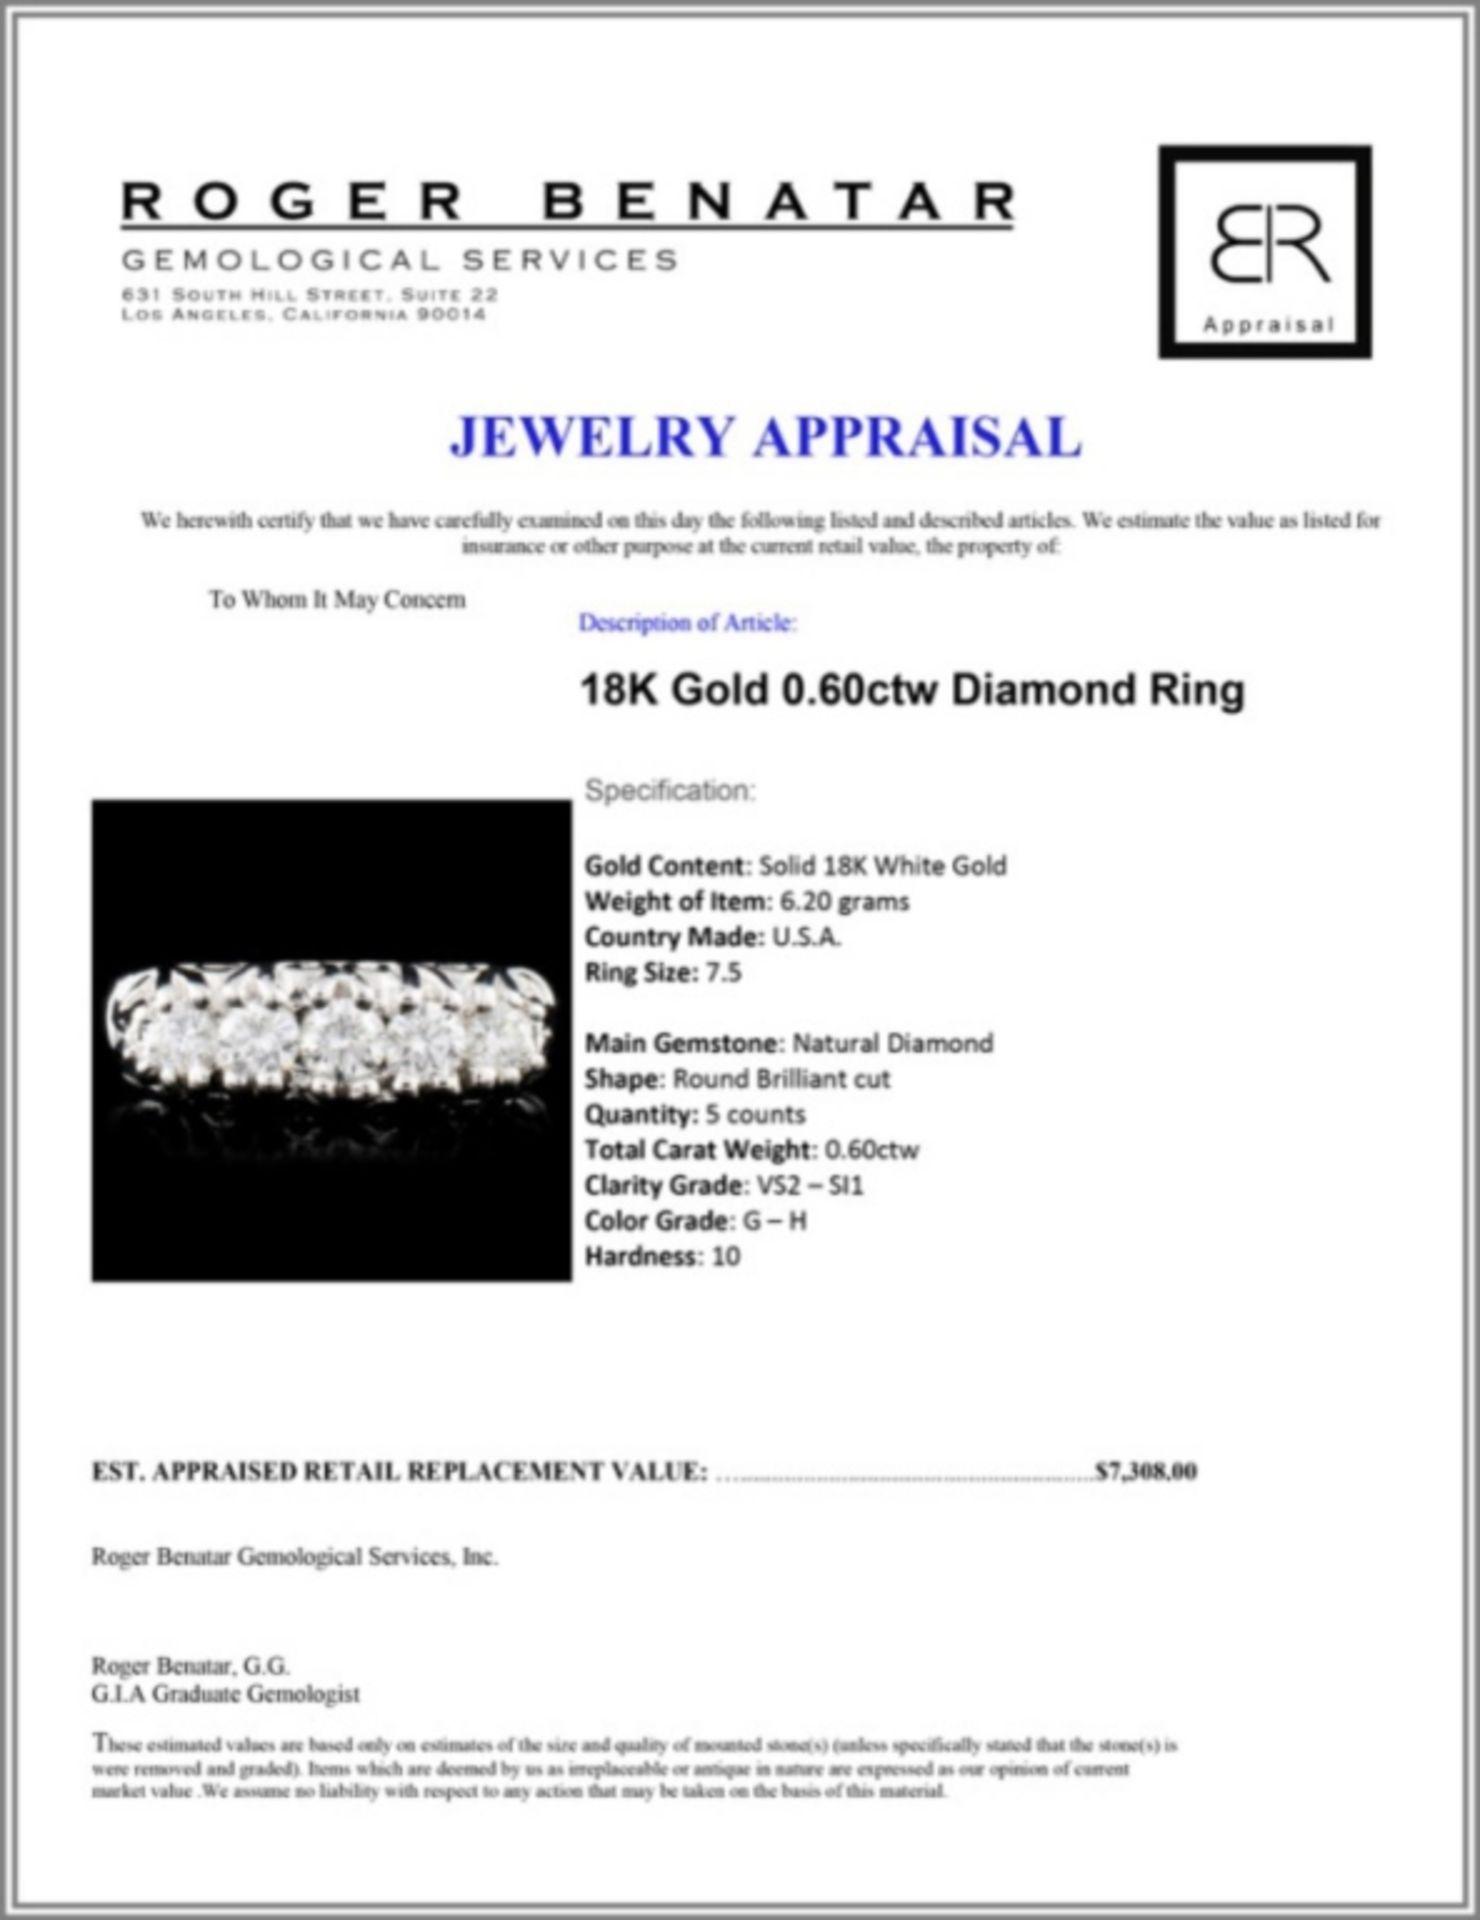 18K Gold 0.60ctw Diamond Ring - Image 3 of 3